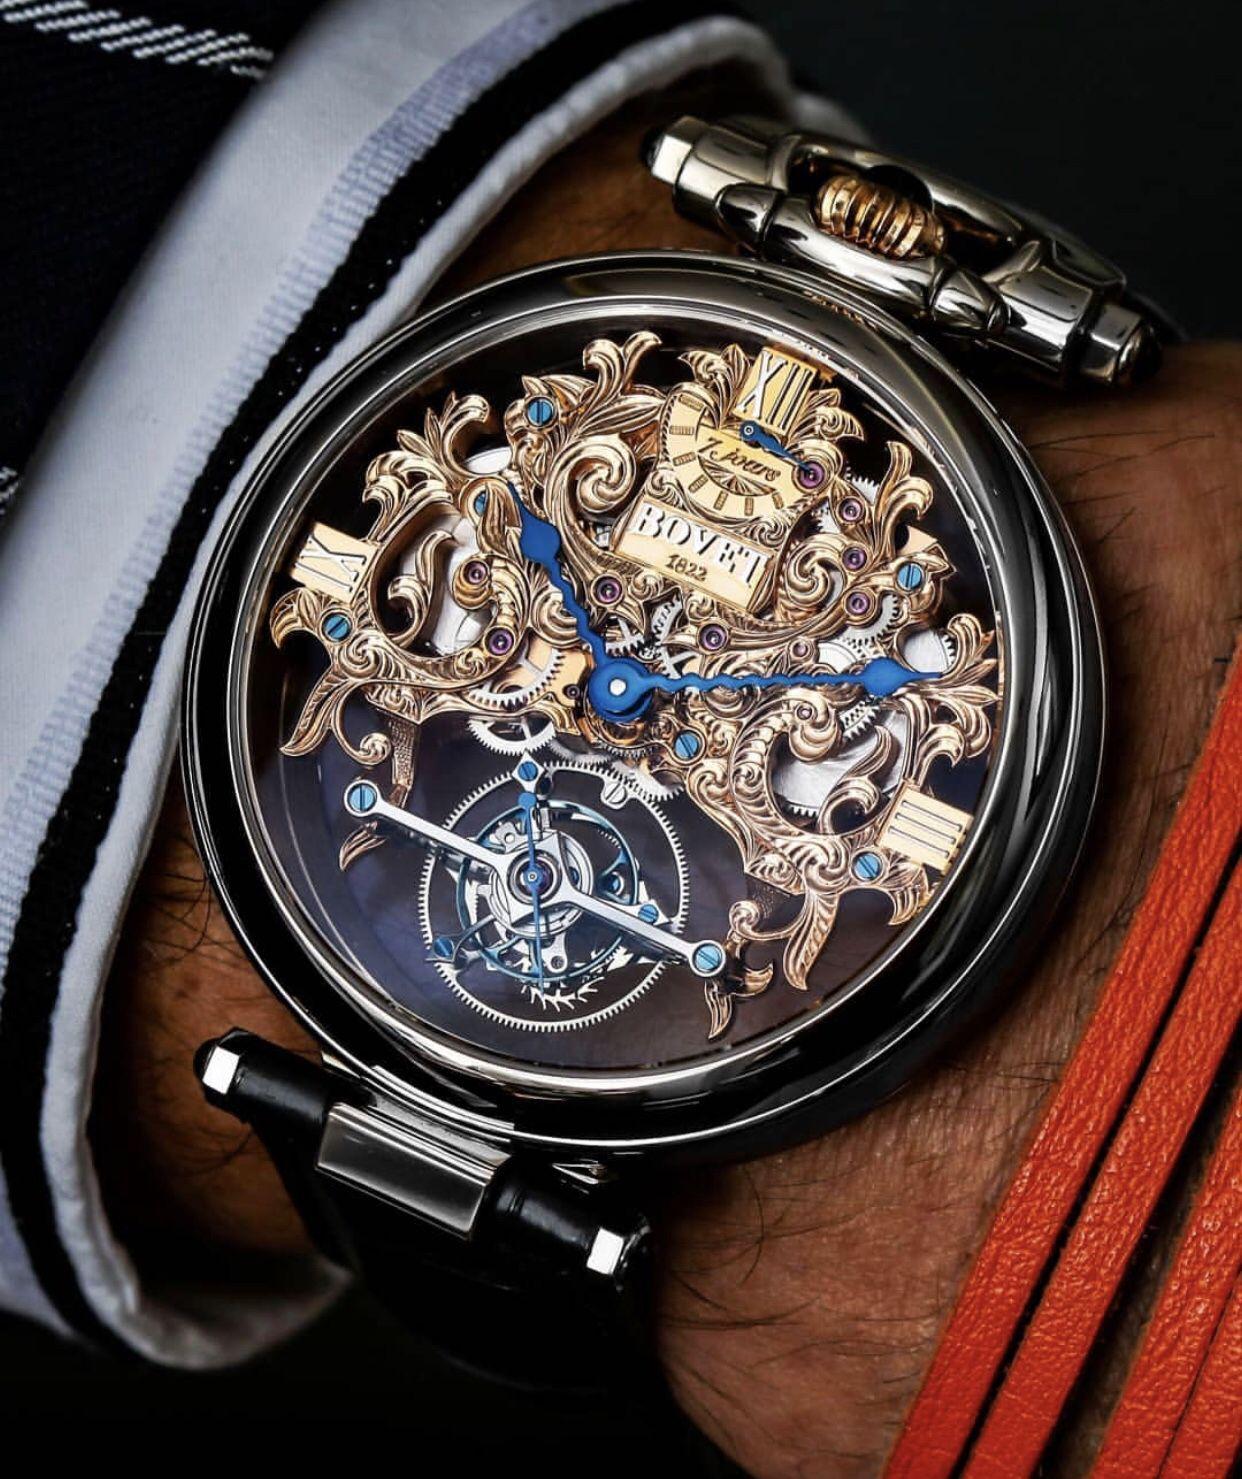 Manoj 2020 Erkek Kol Saatleri Emporio Armani Watches